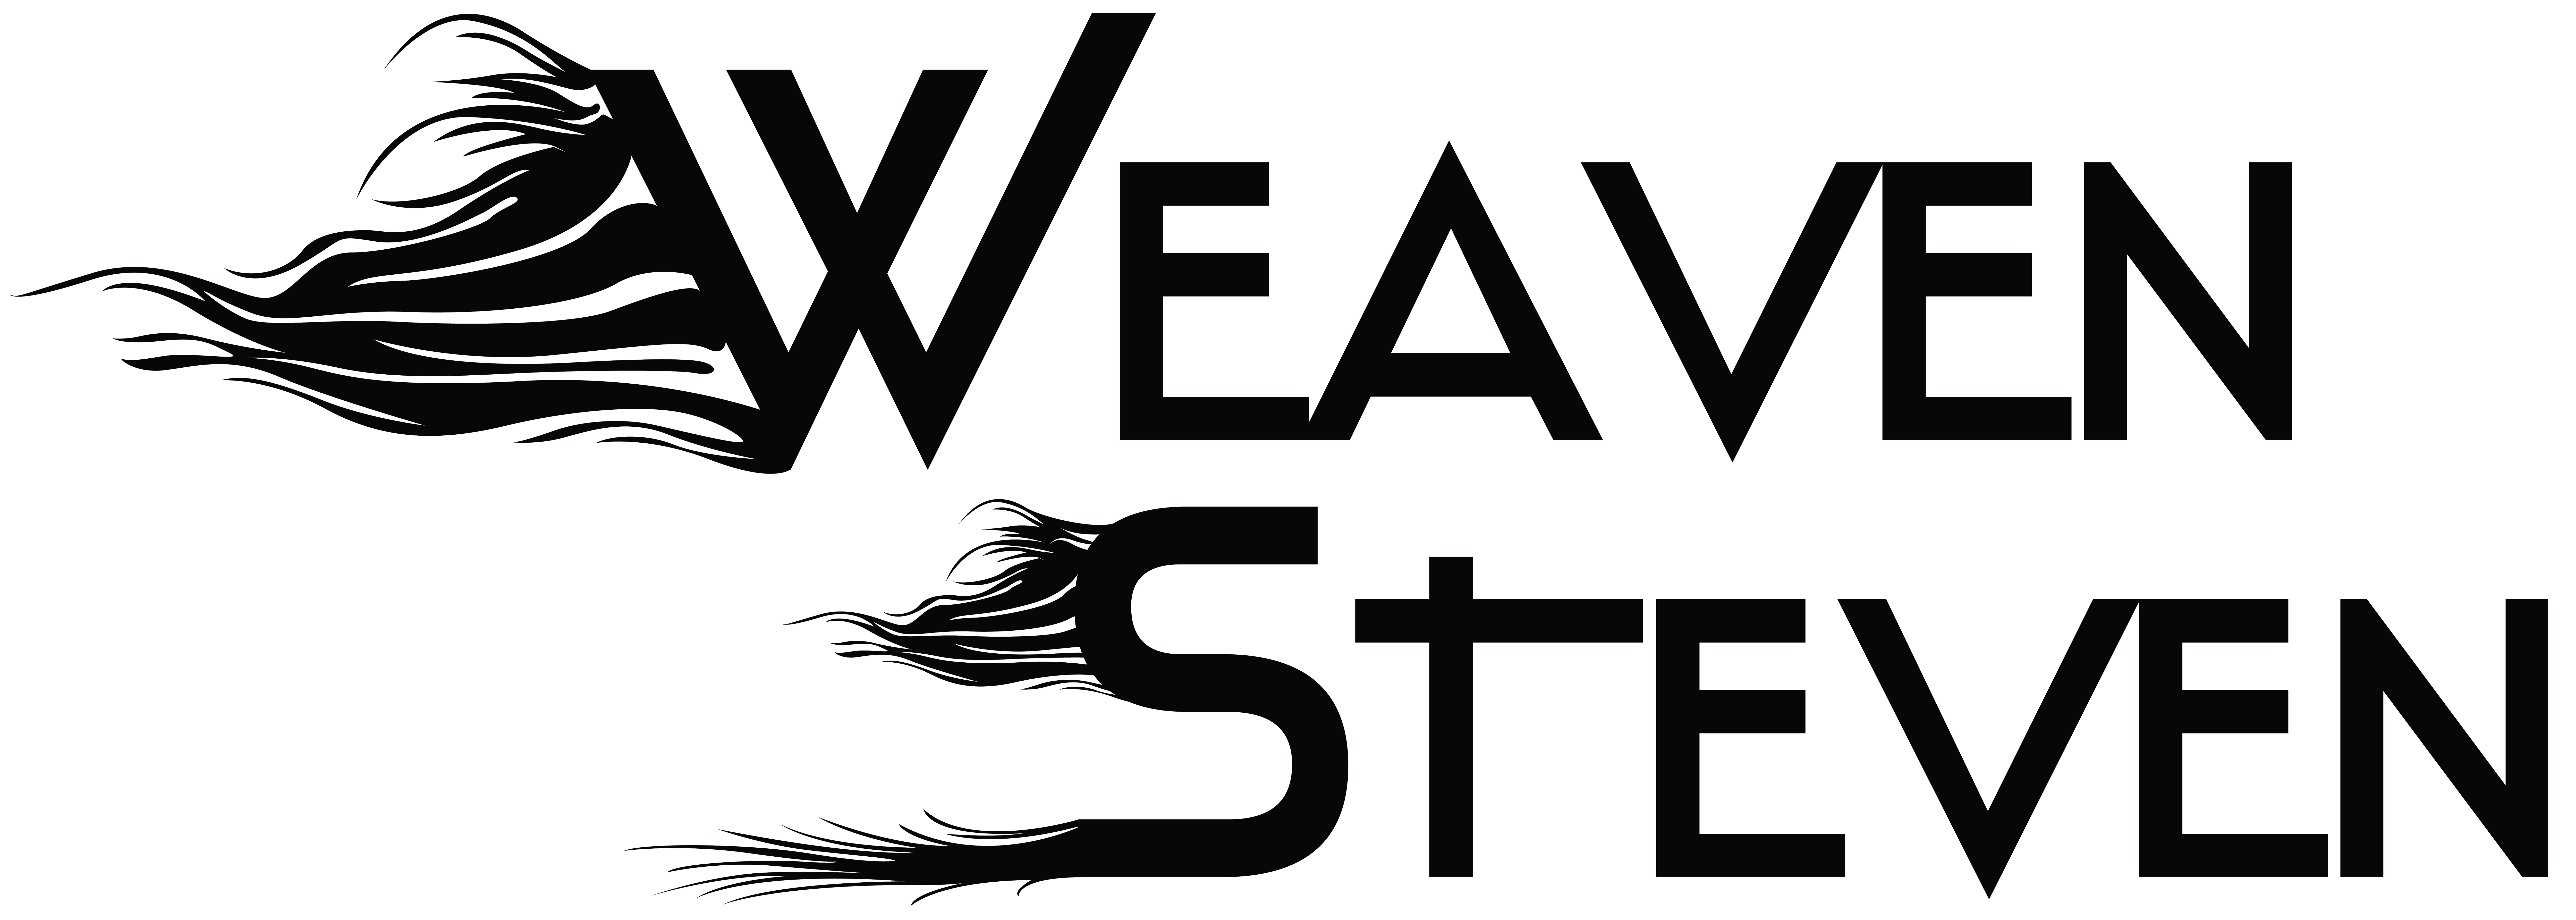 Weaven Steven's Signature